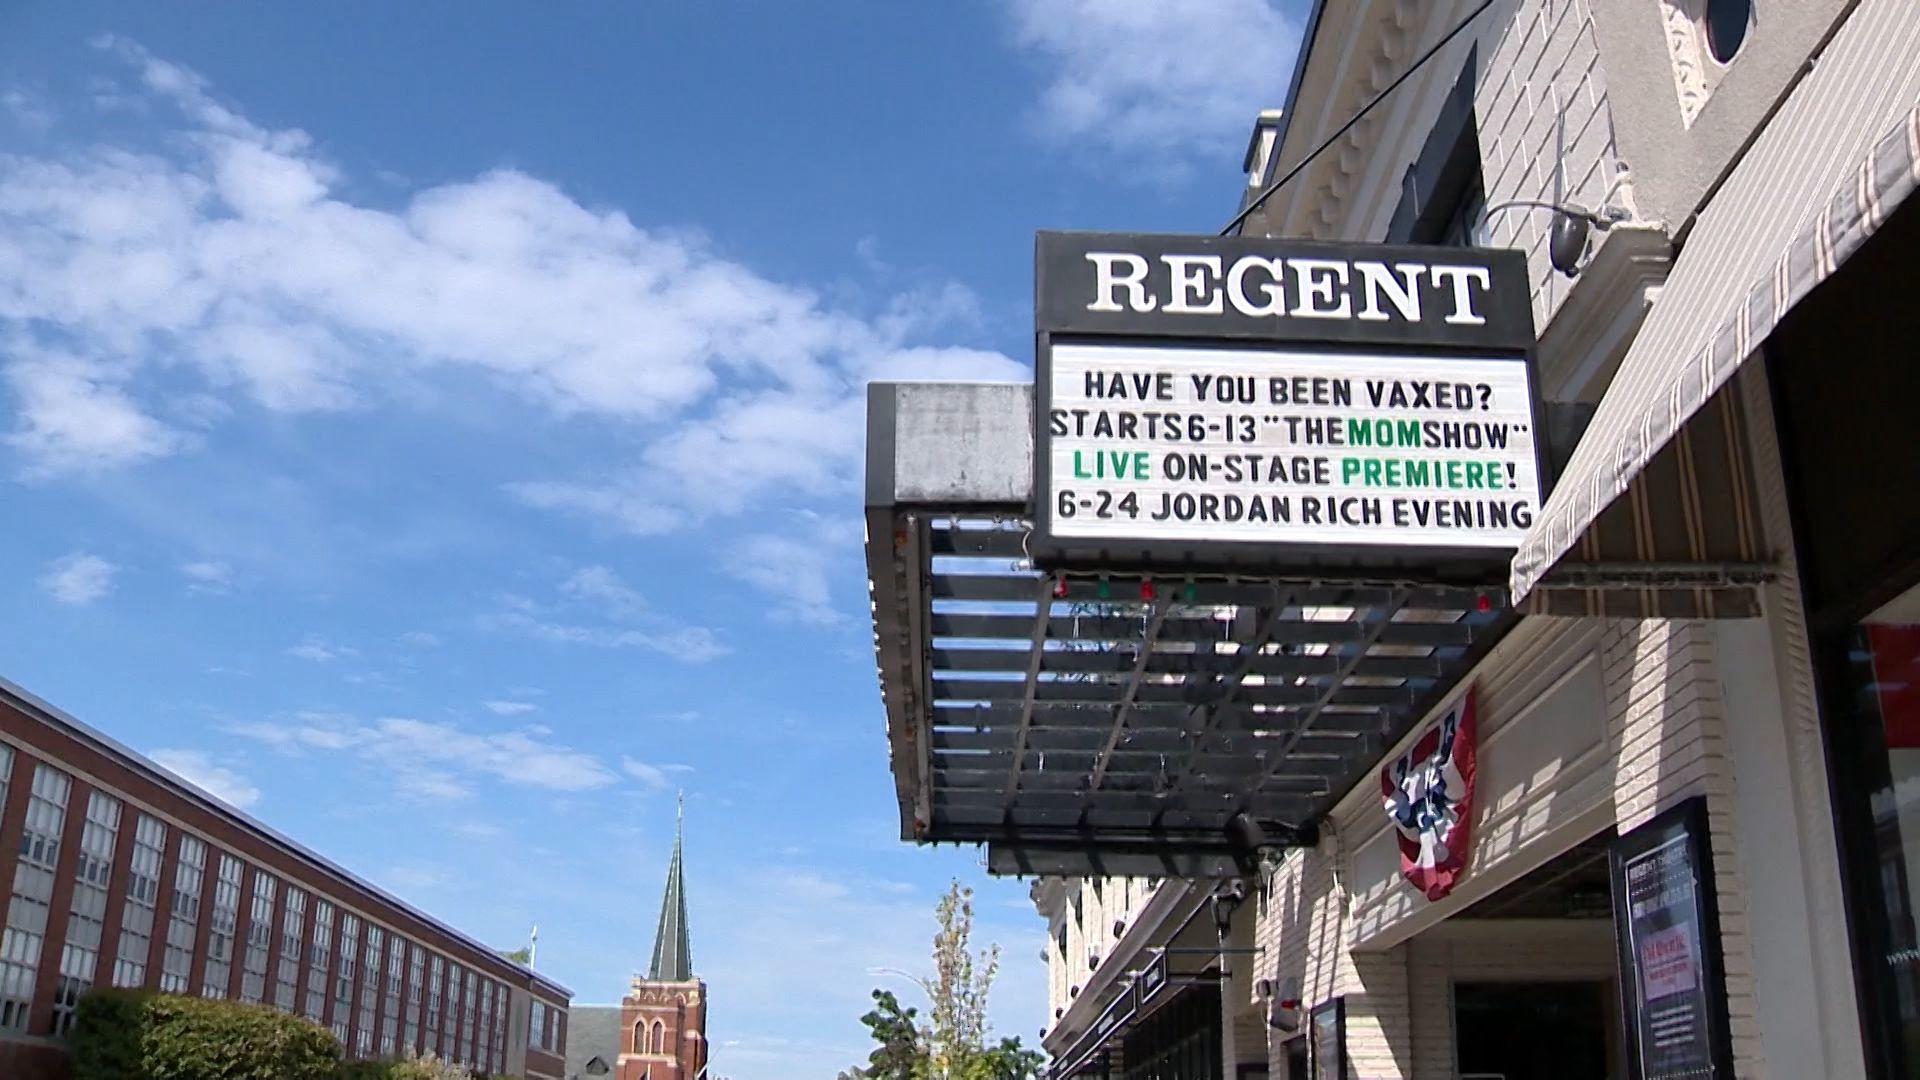 Live theatre making its return to Massachusetts